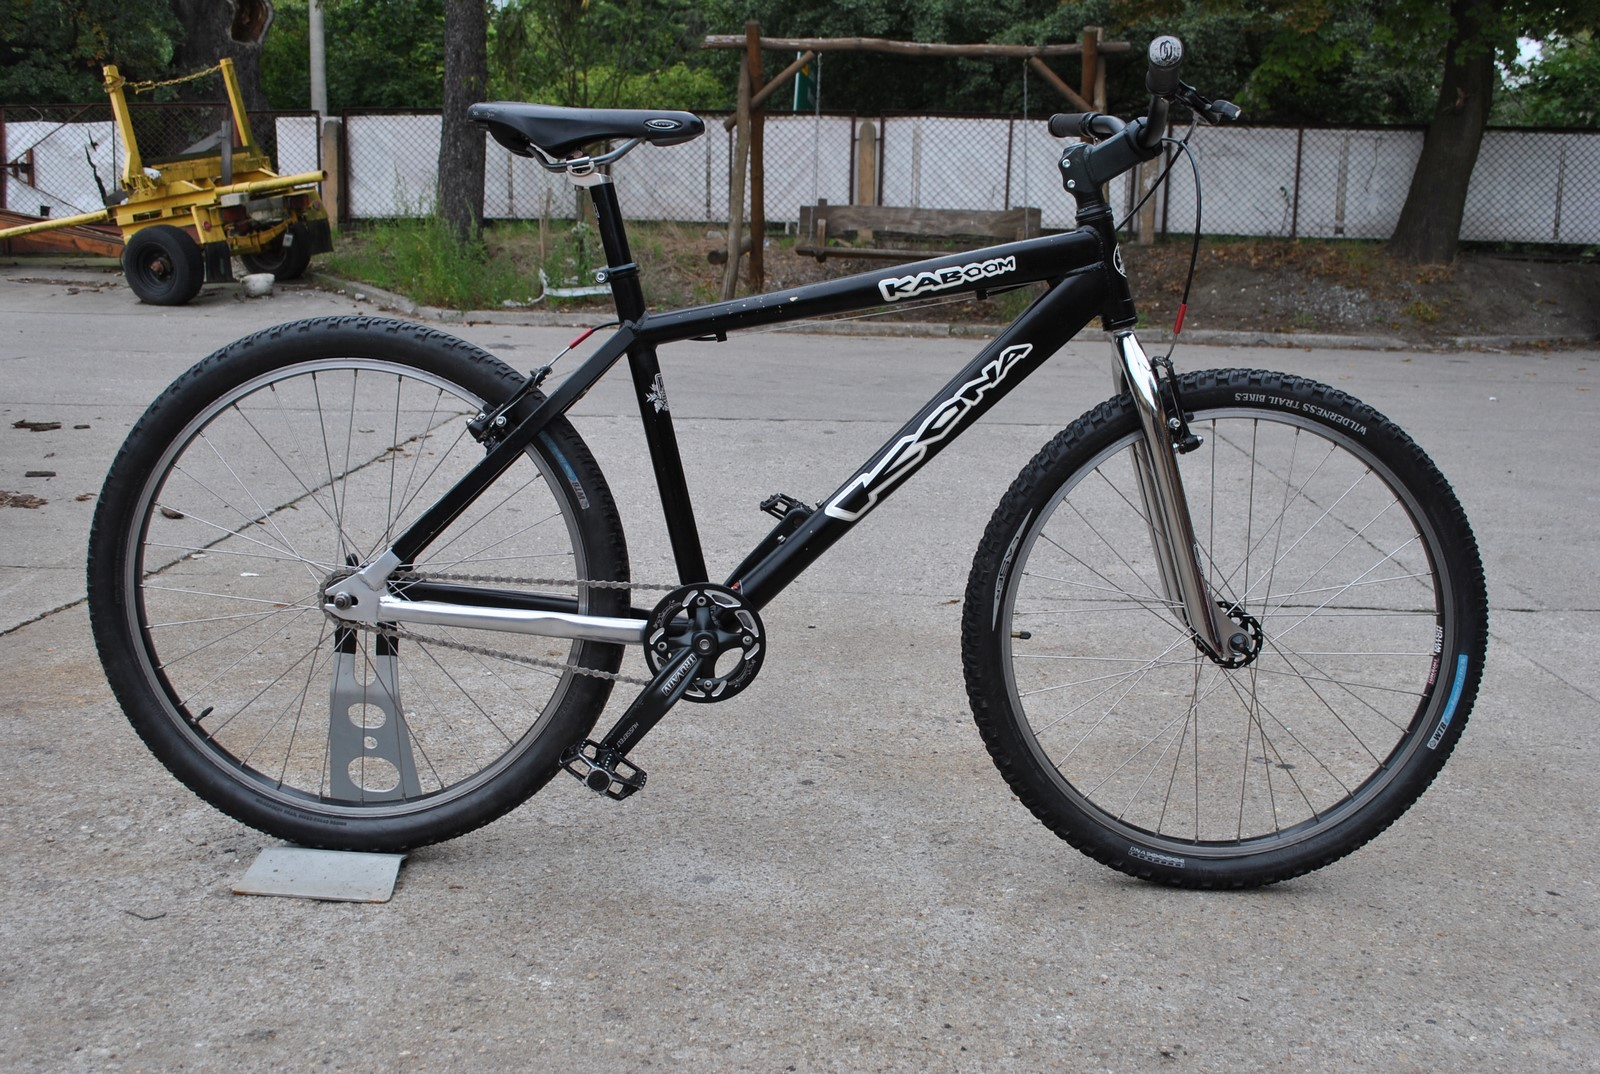 KONA KABOOM 18'' rower single speed STREET DIRT